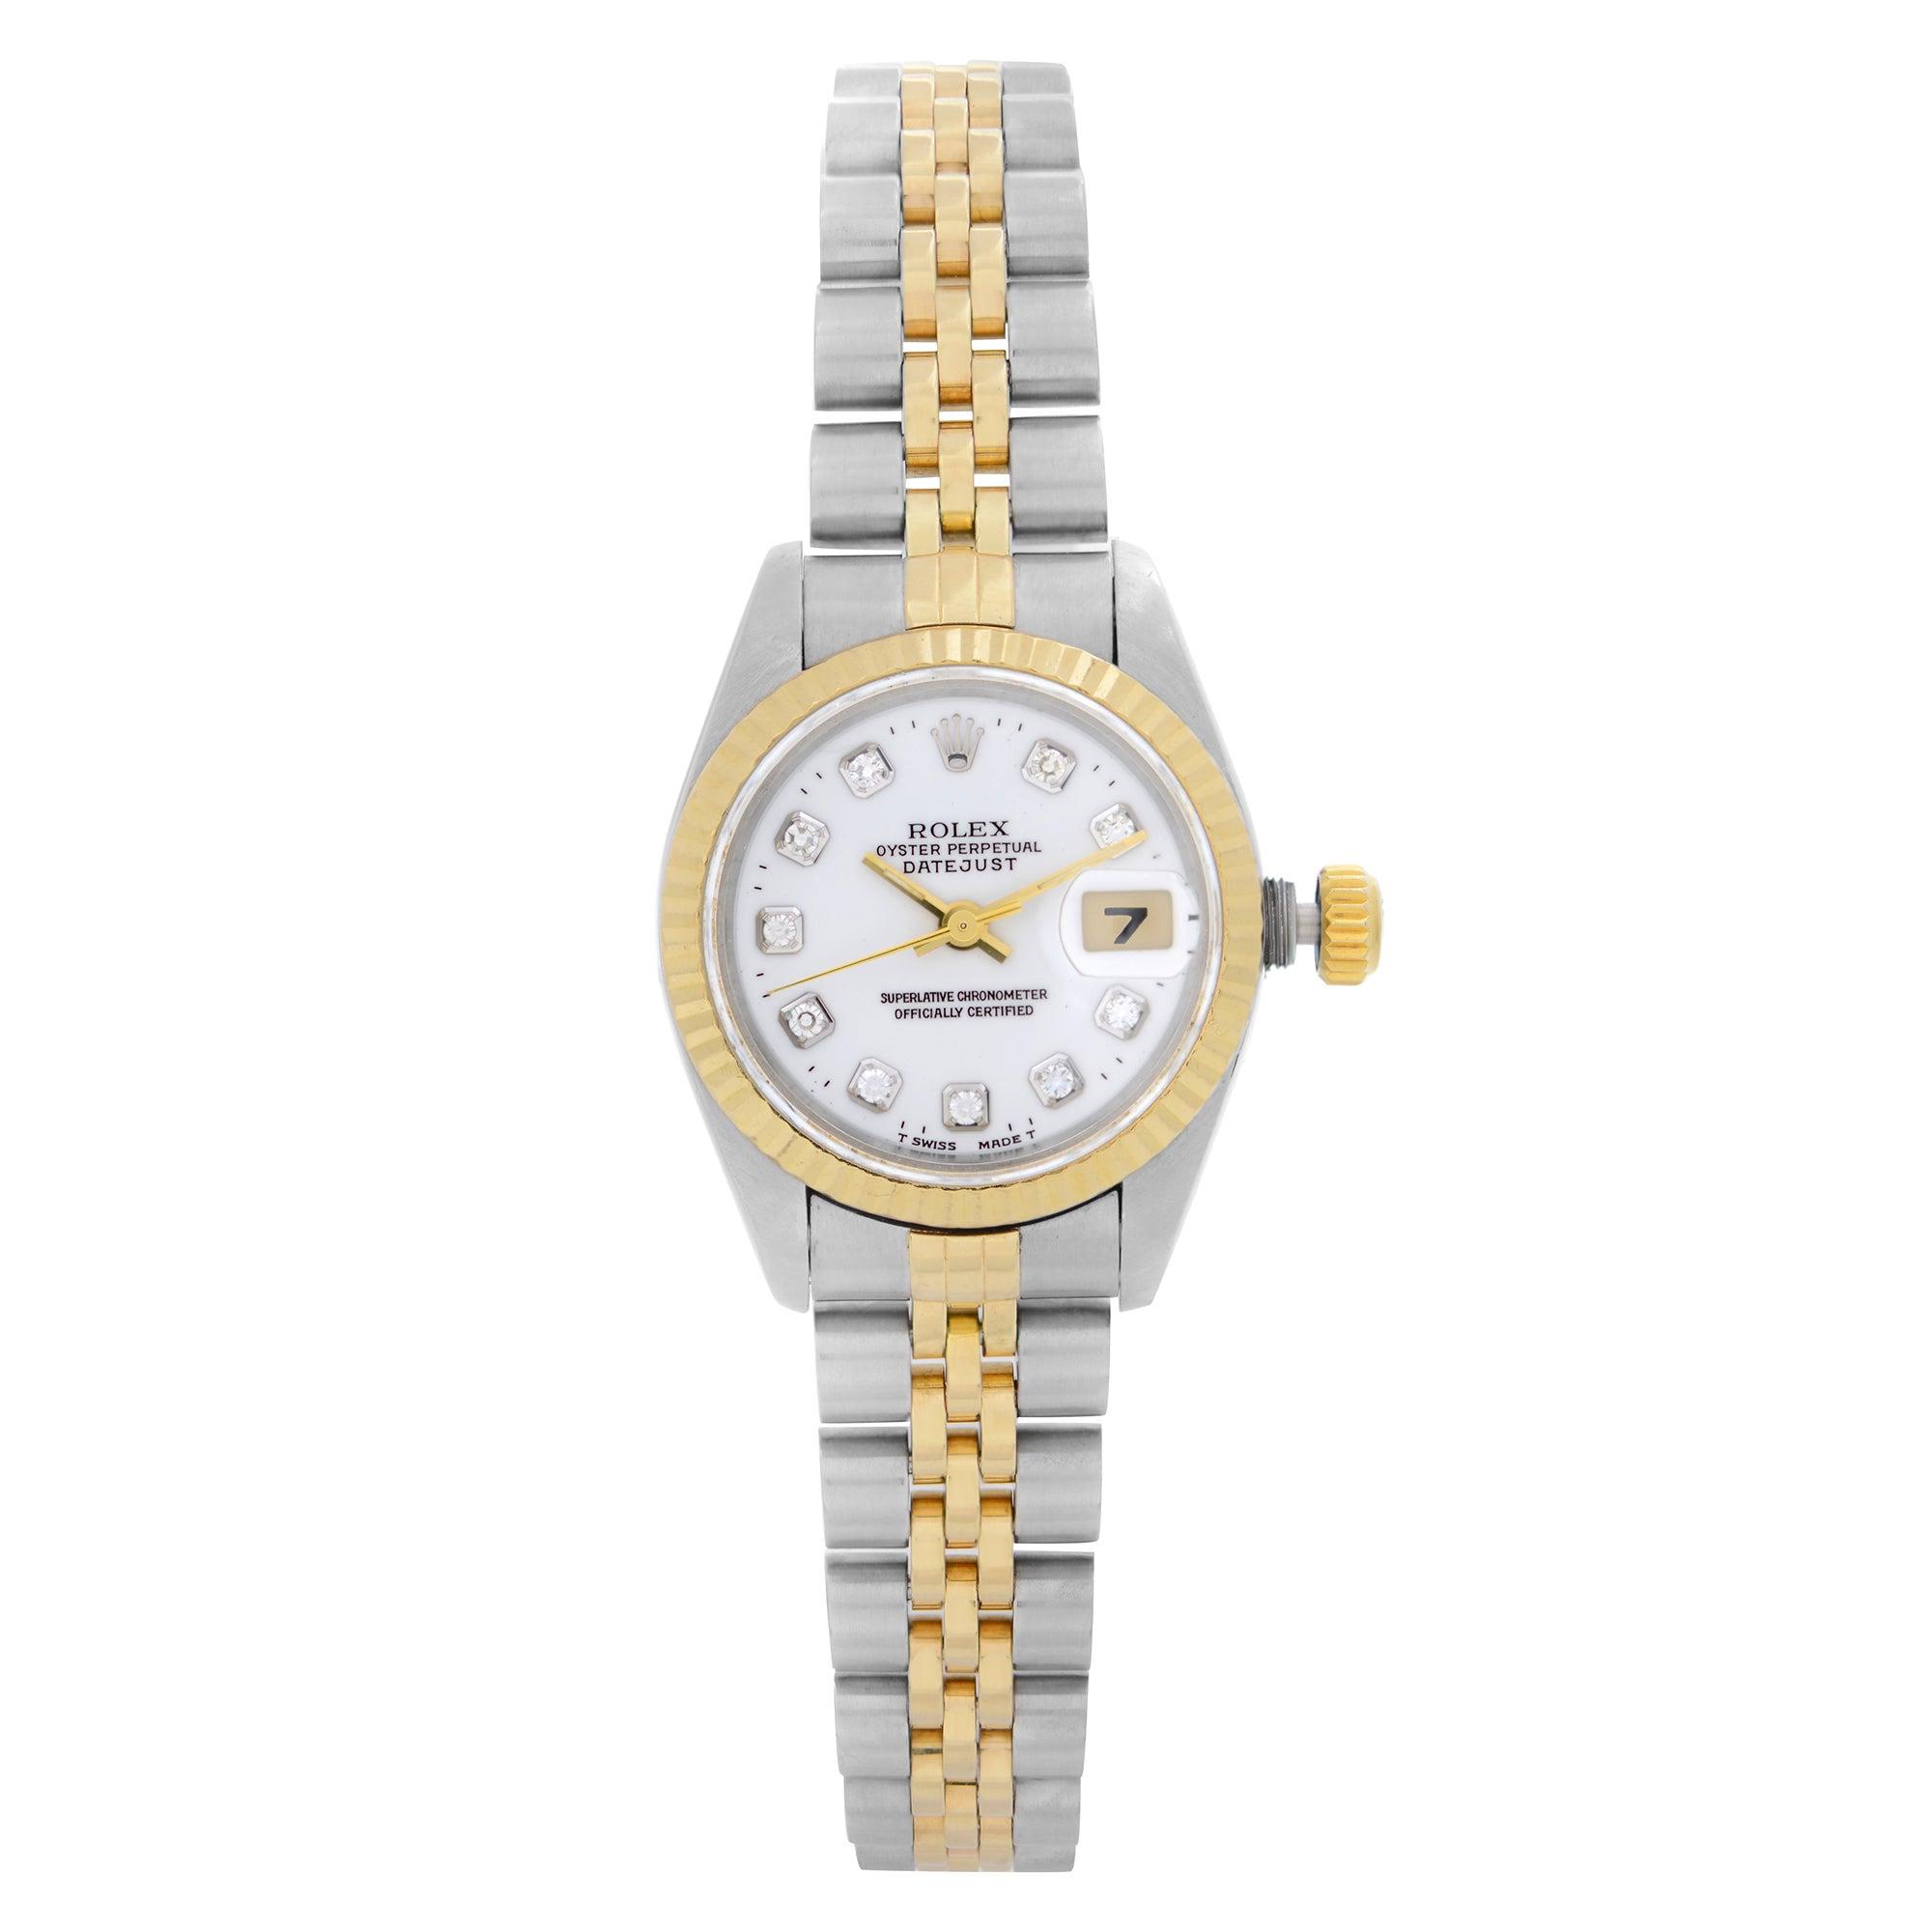 Rolex Datejust 18K Yellow Gold Steel White Diamond Dial Ladies Watch 69173